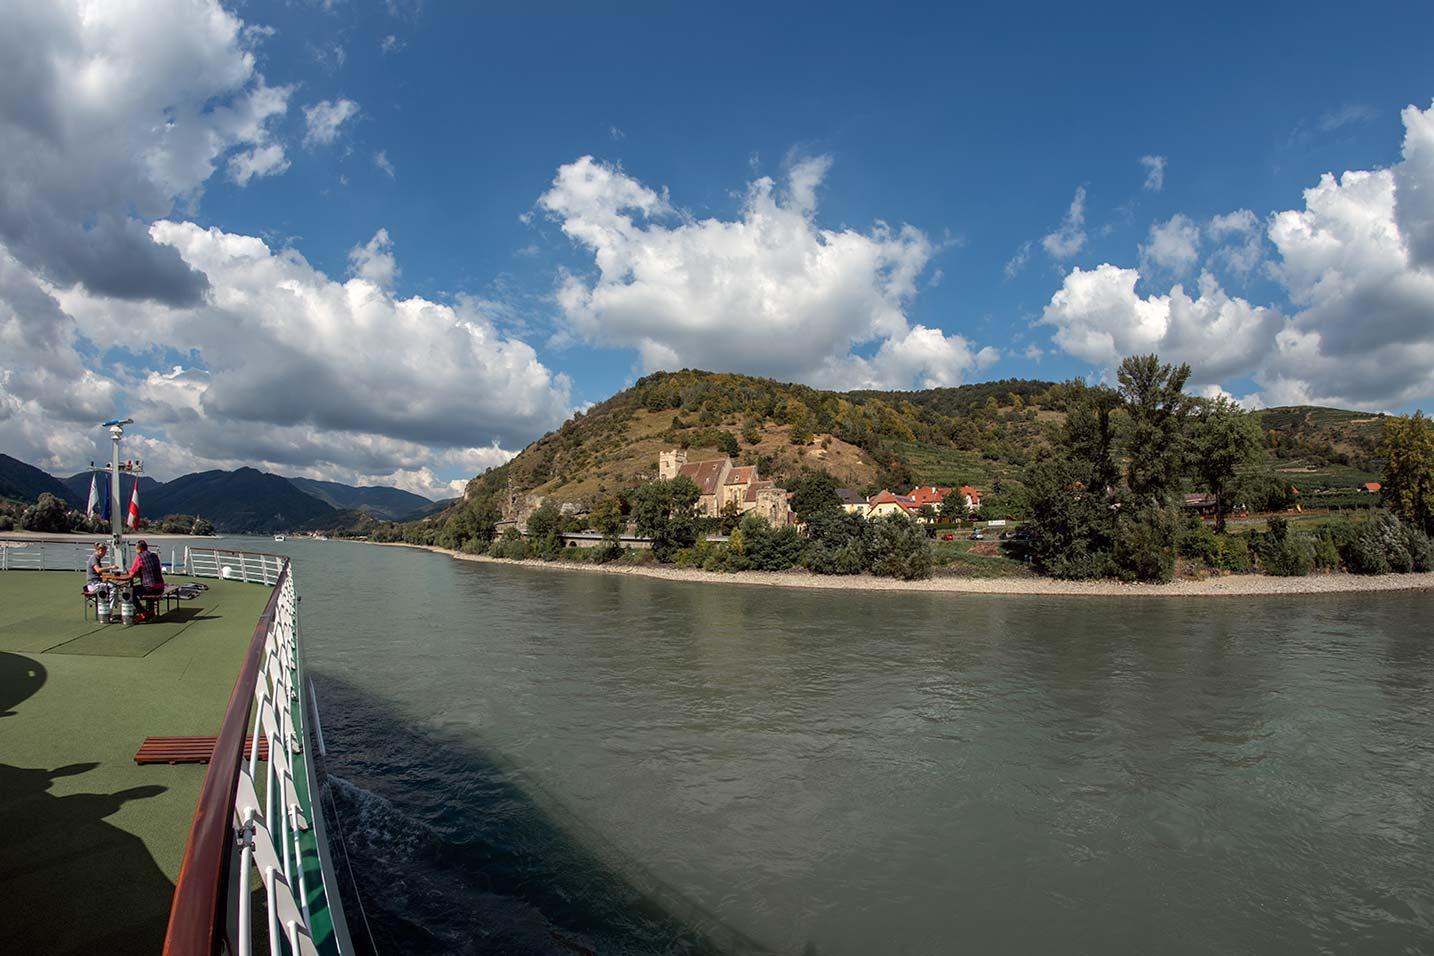 Reisetipps Flusskreuzfahrt